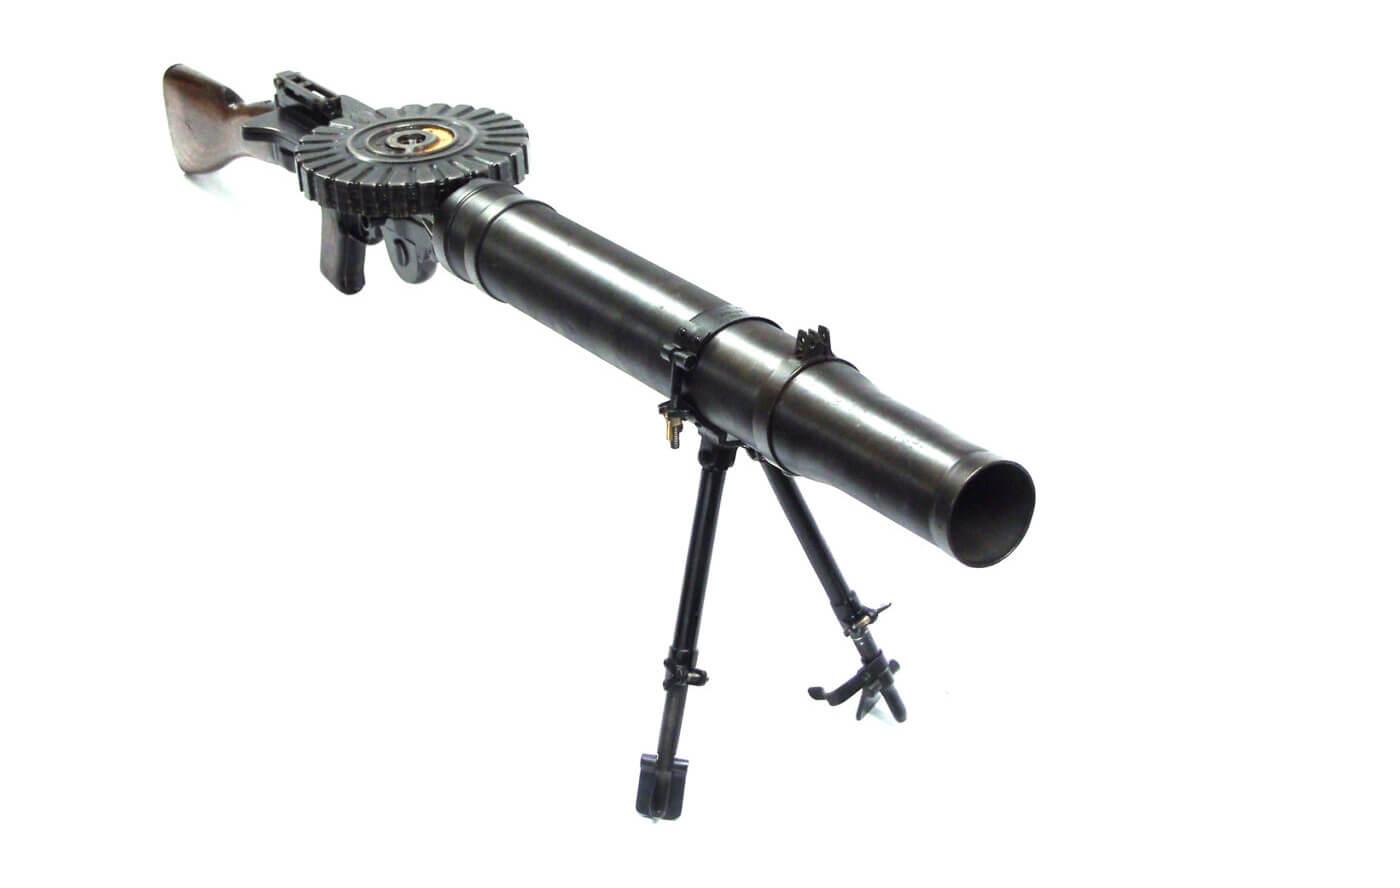 Lewis Gun with bipod